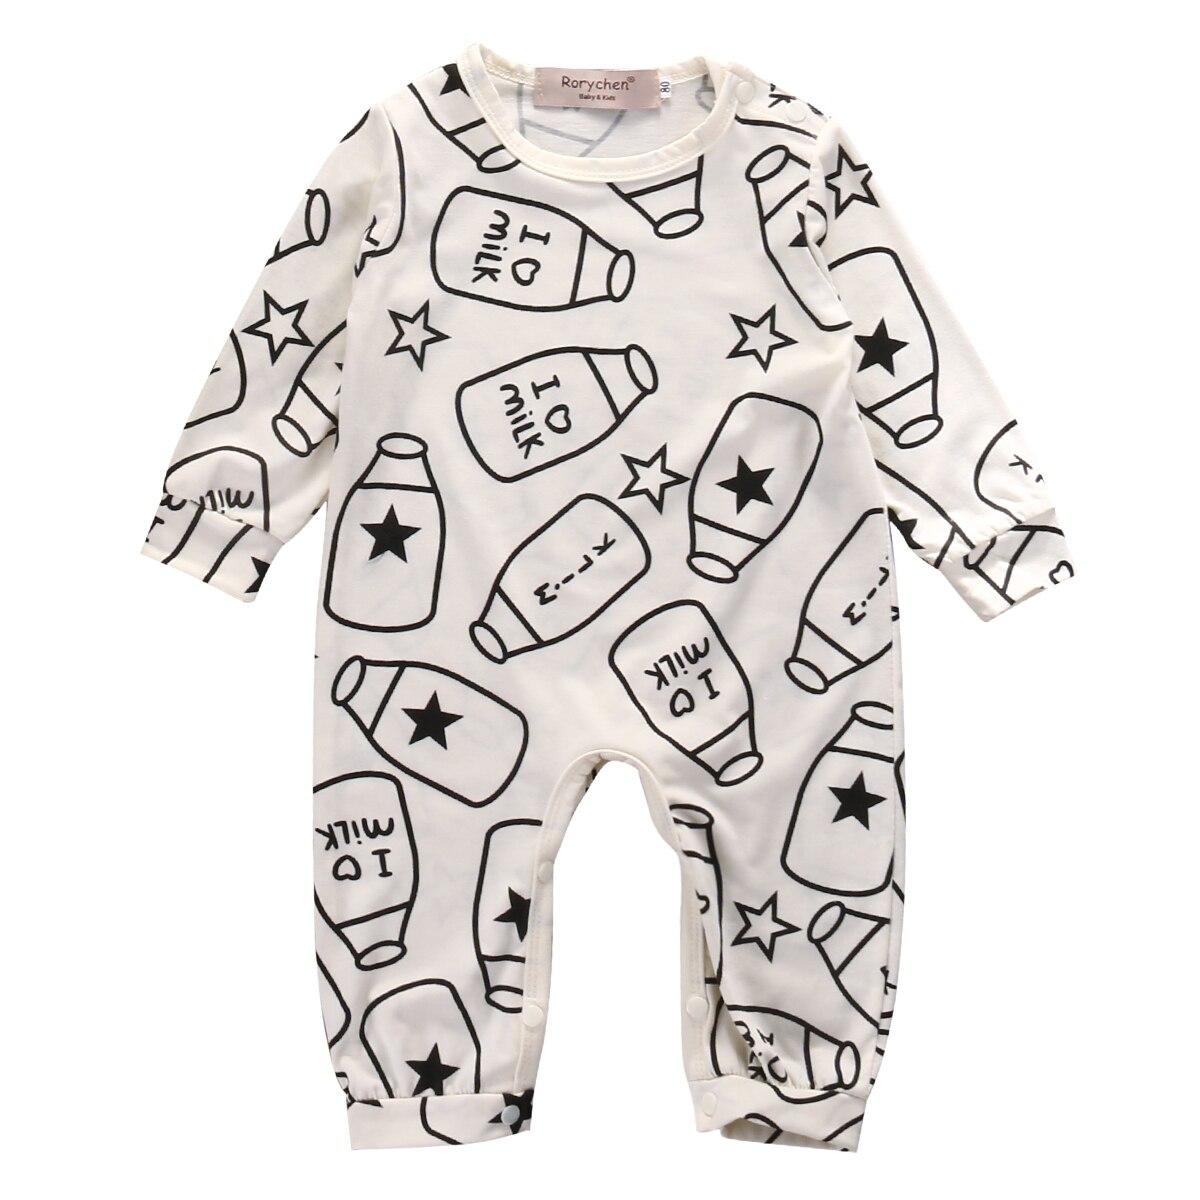 Newborn Baby Clothes Romper Boys Girls Cute Jumpsuit Milk Bo